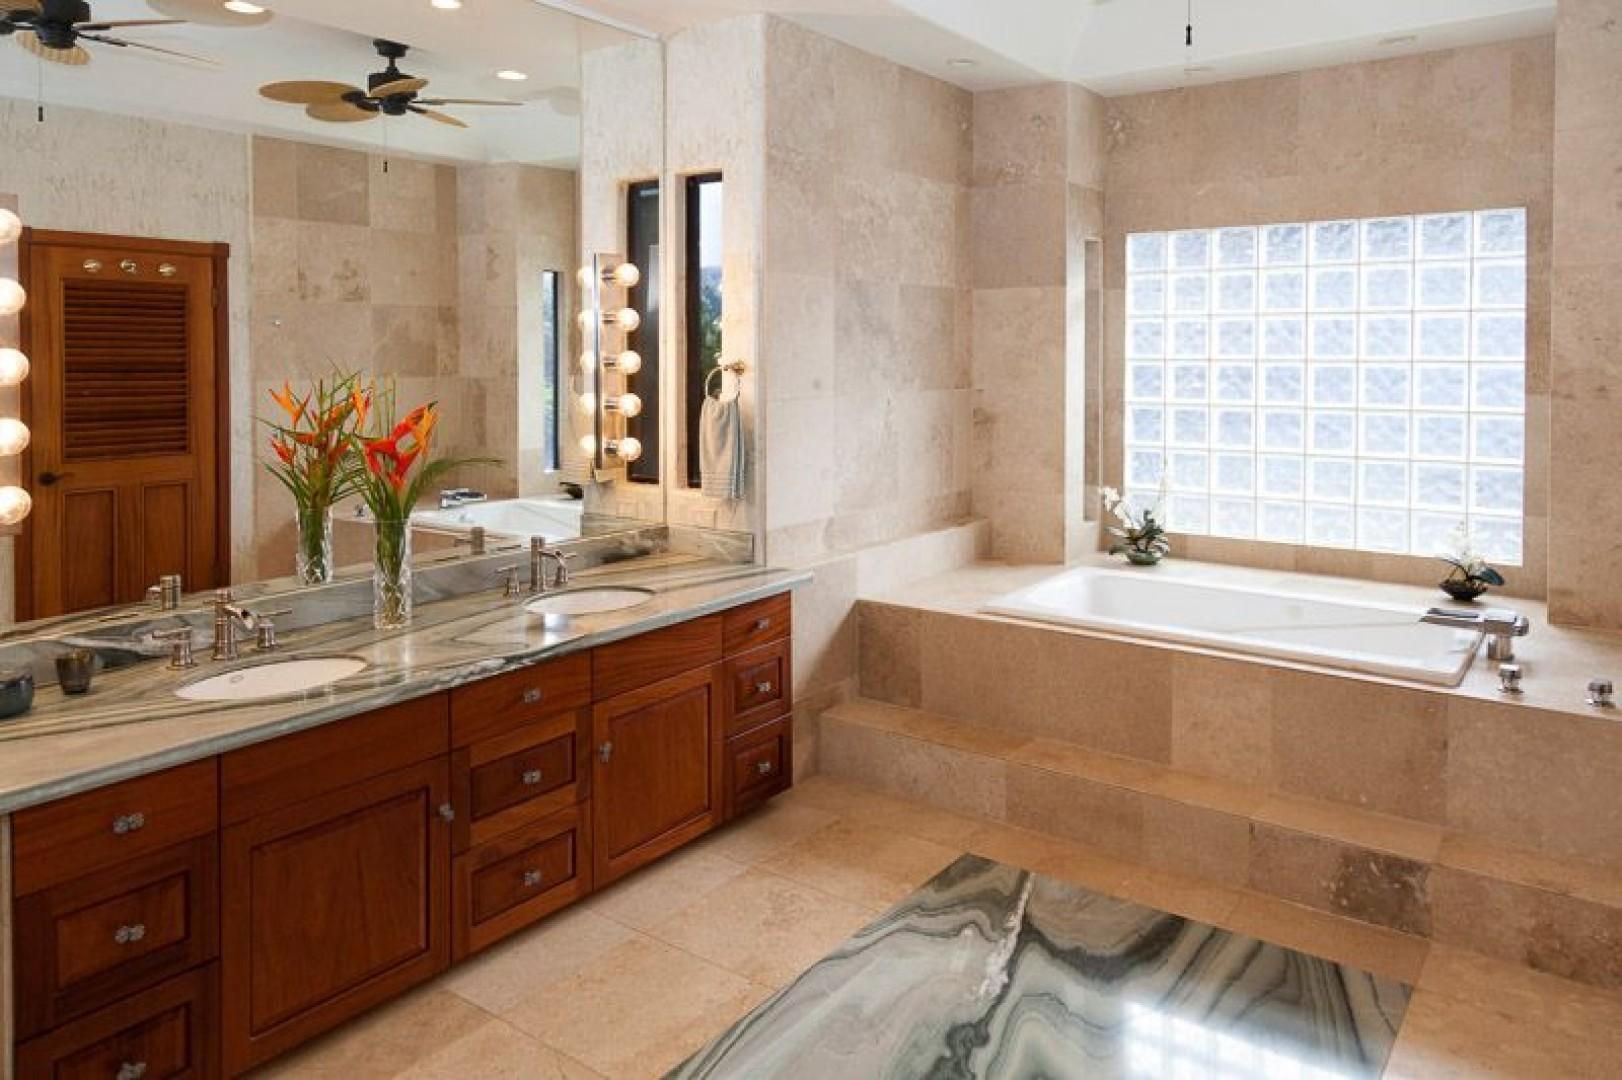 South Master Bath enjoy soaking in the large tub